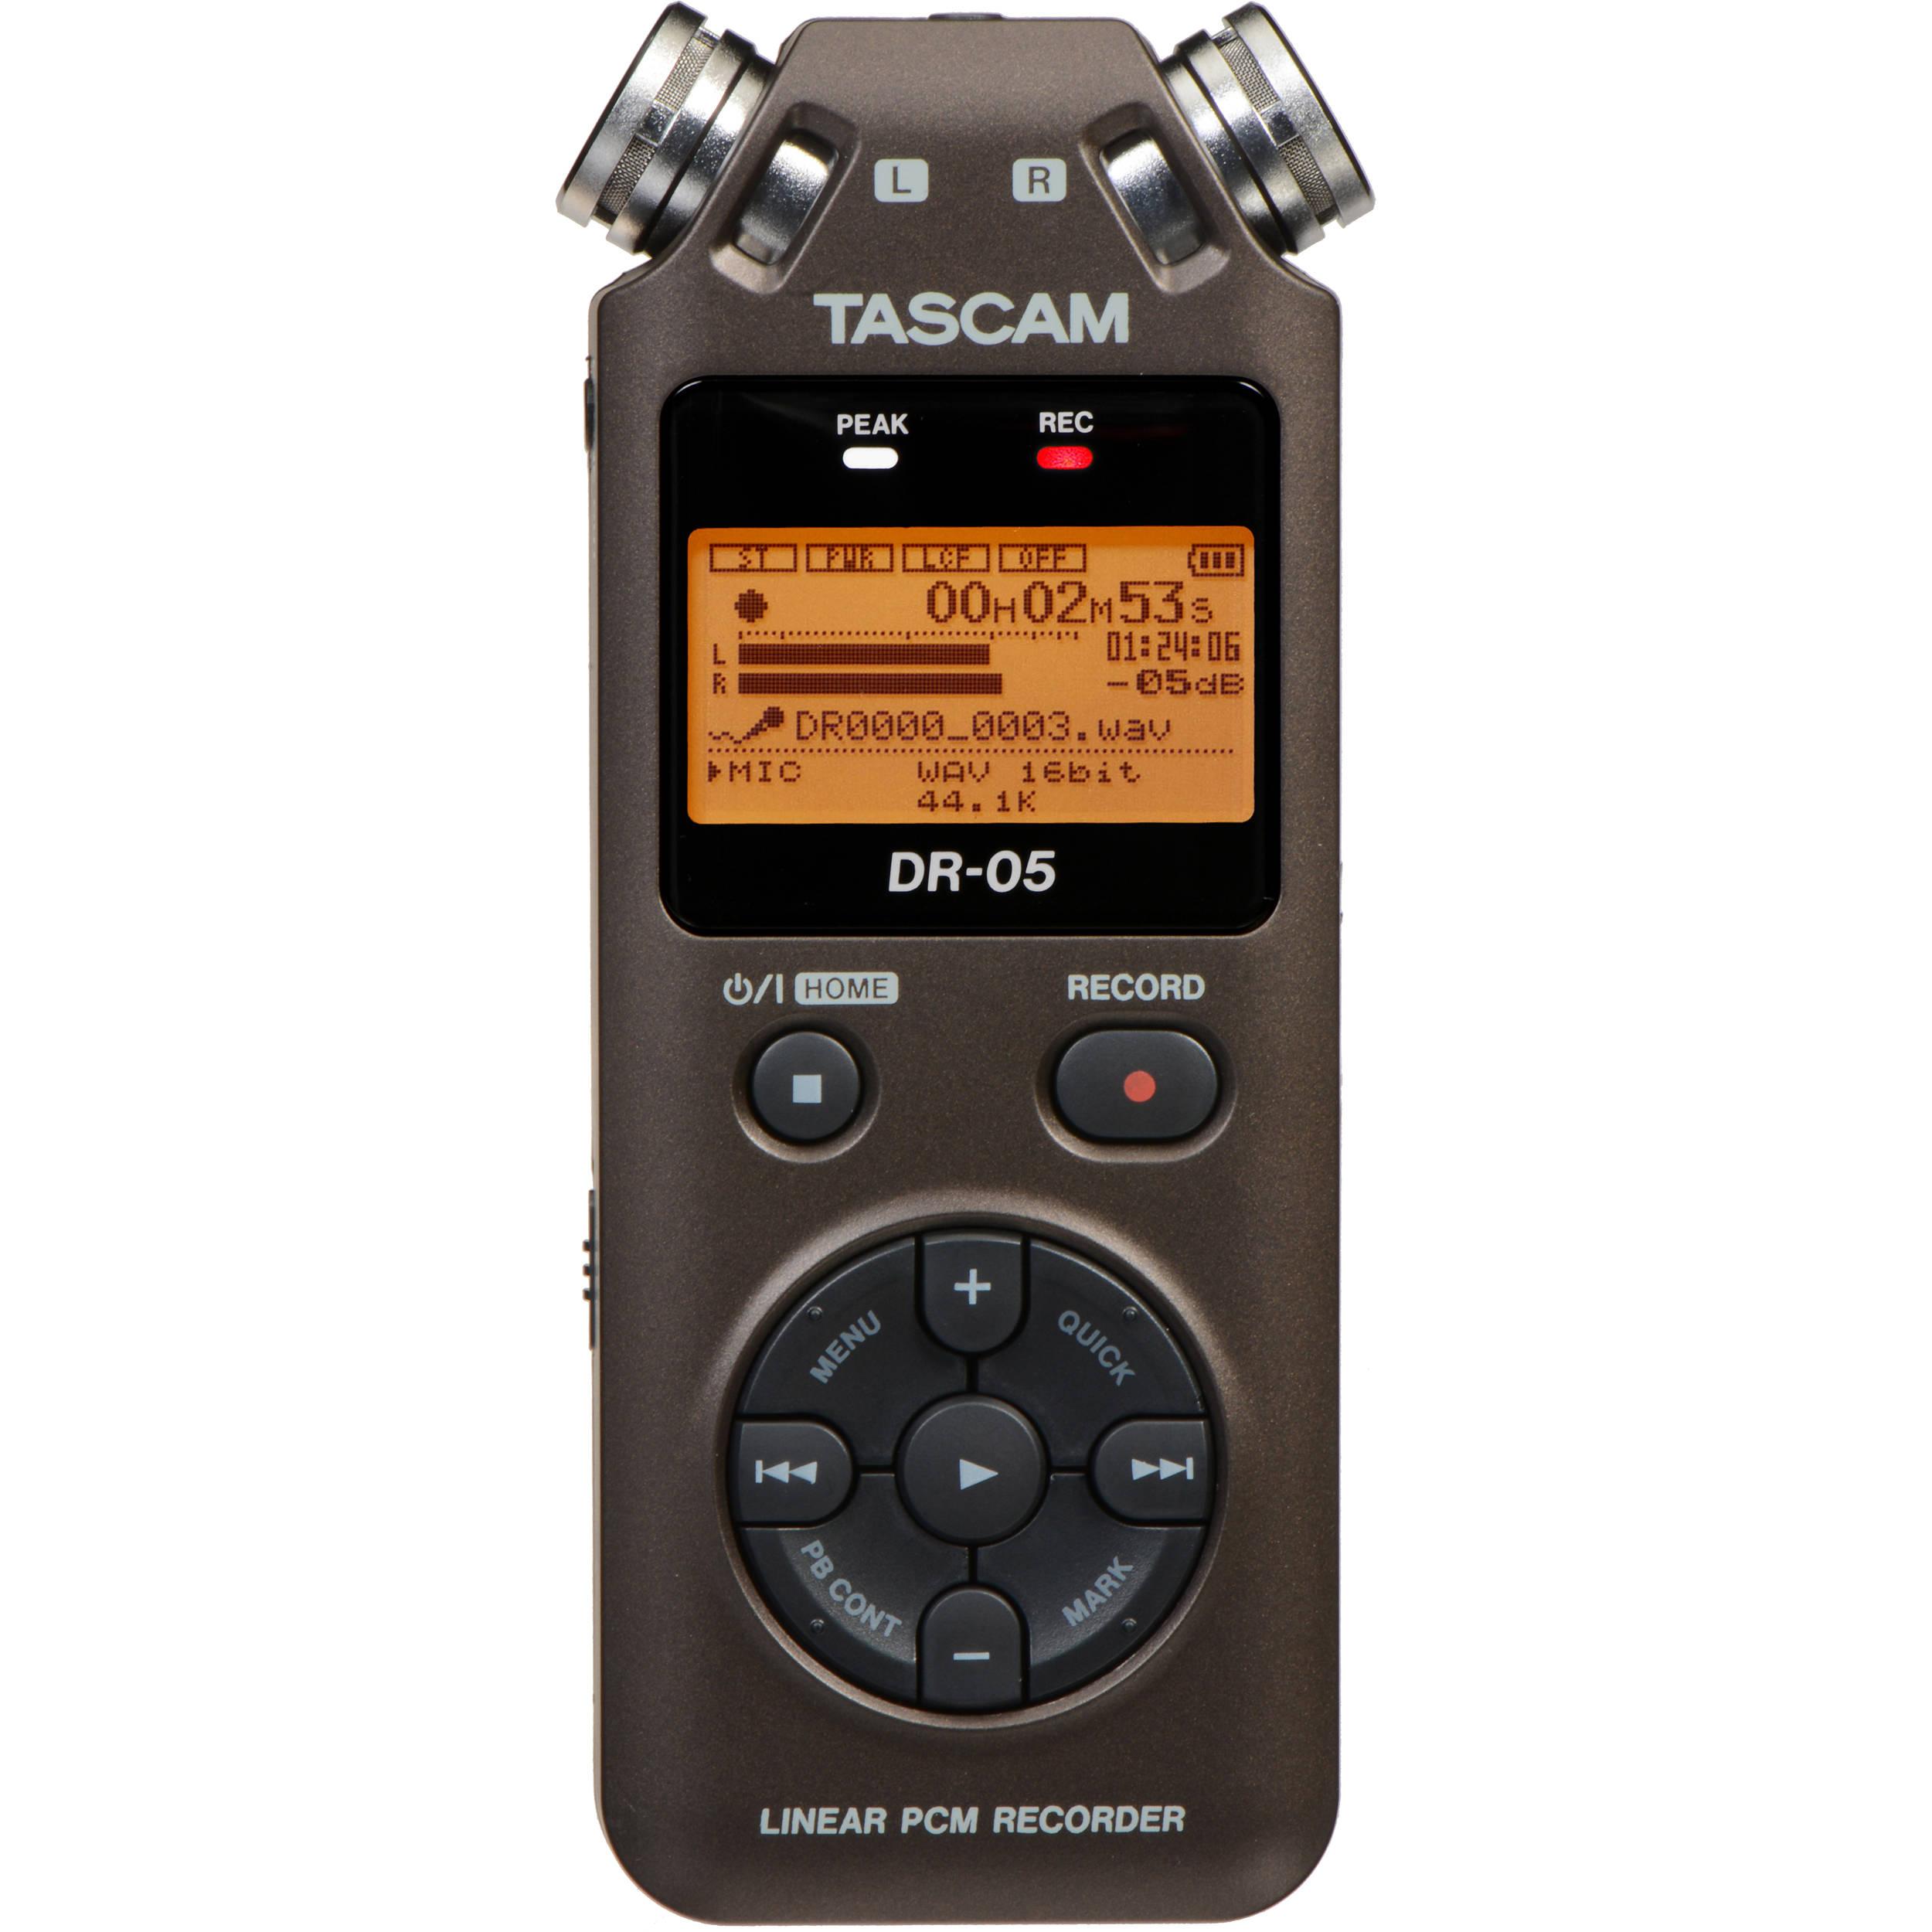 Tascam Recorder Dr 05 : tascam dr 05 portable handheld digital audio recorder dr 05br ~ Vivirlamusica.com Haus und Dekorationen